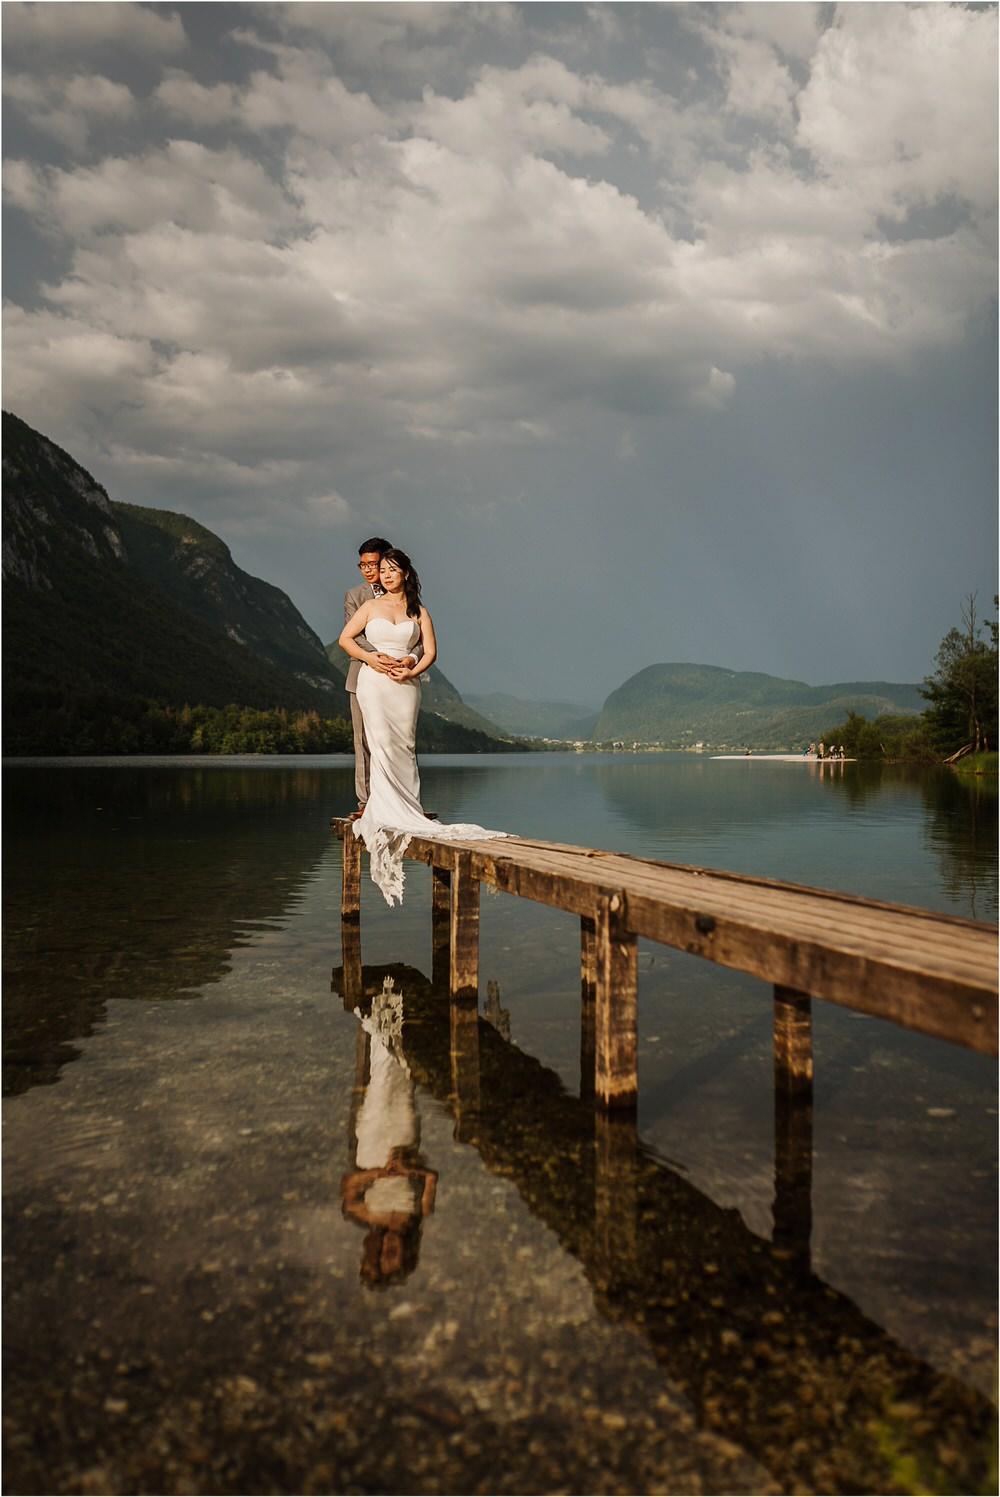 prewedding bled lake slovenia asian couple ljubljana engagement singapore love bohinj lake 0046.jpg